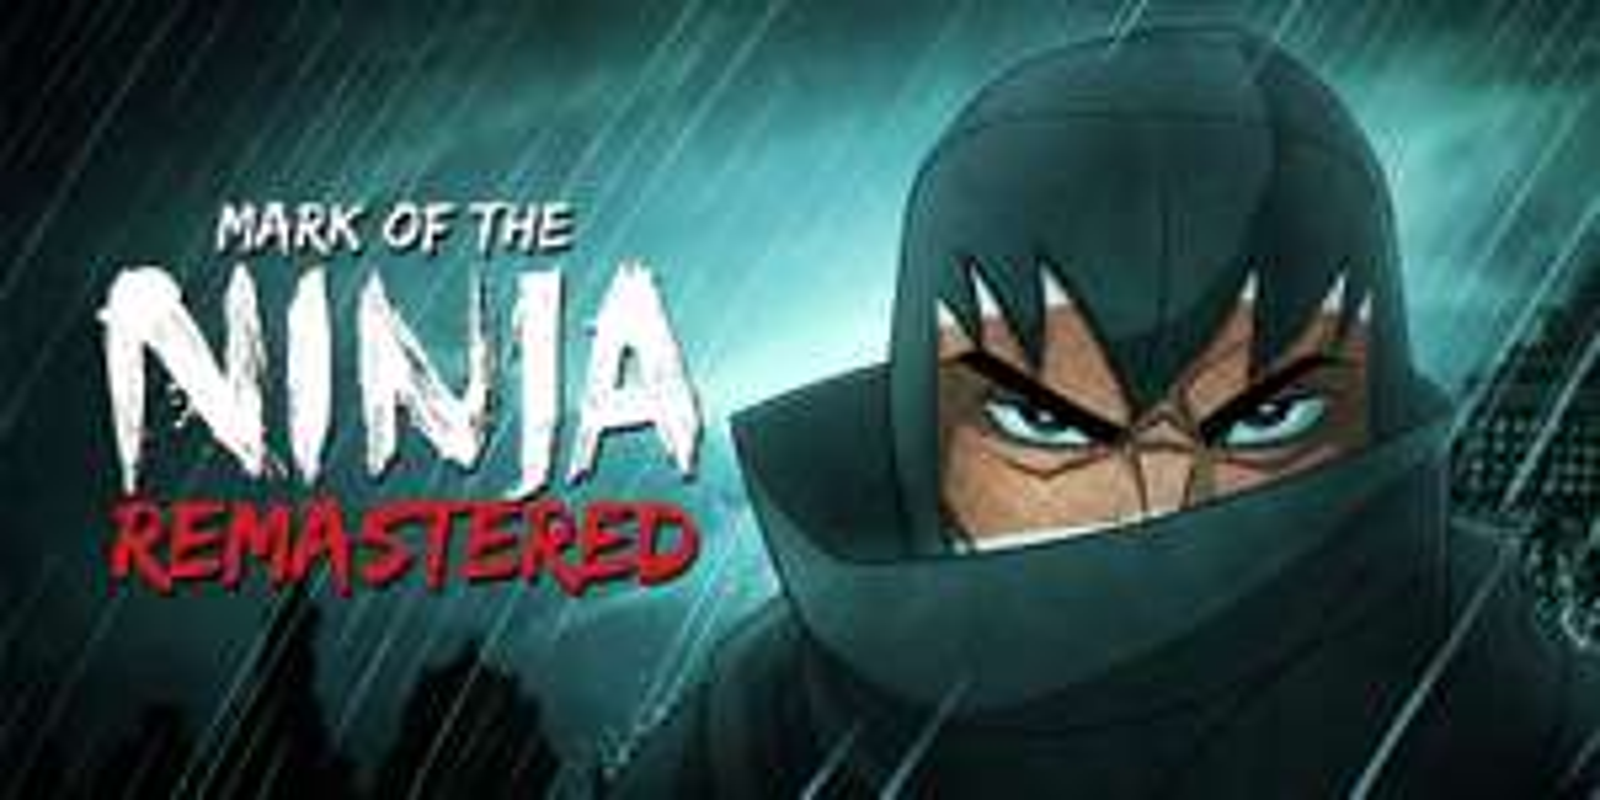 Mark of the Ninja Remastered sur Switch (dématérialisé)